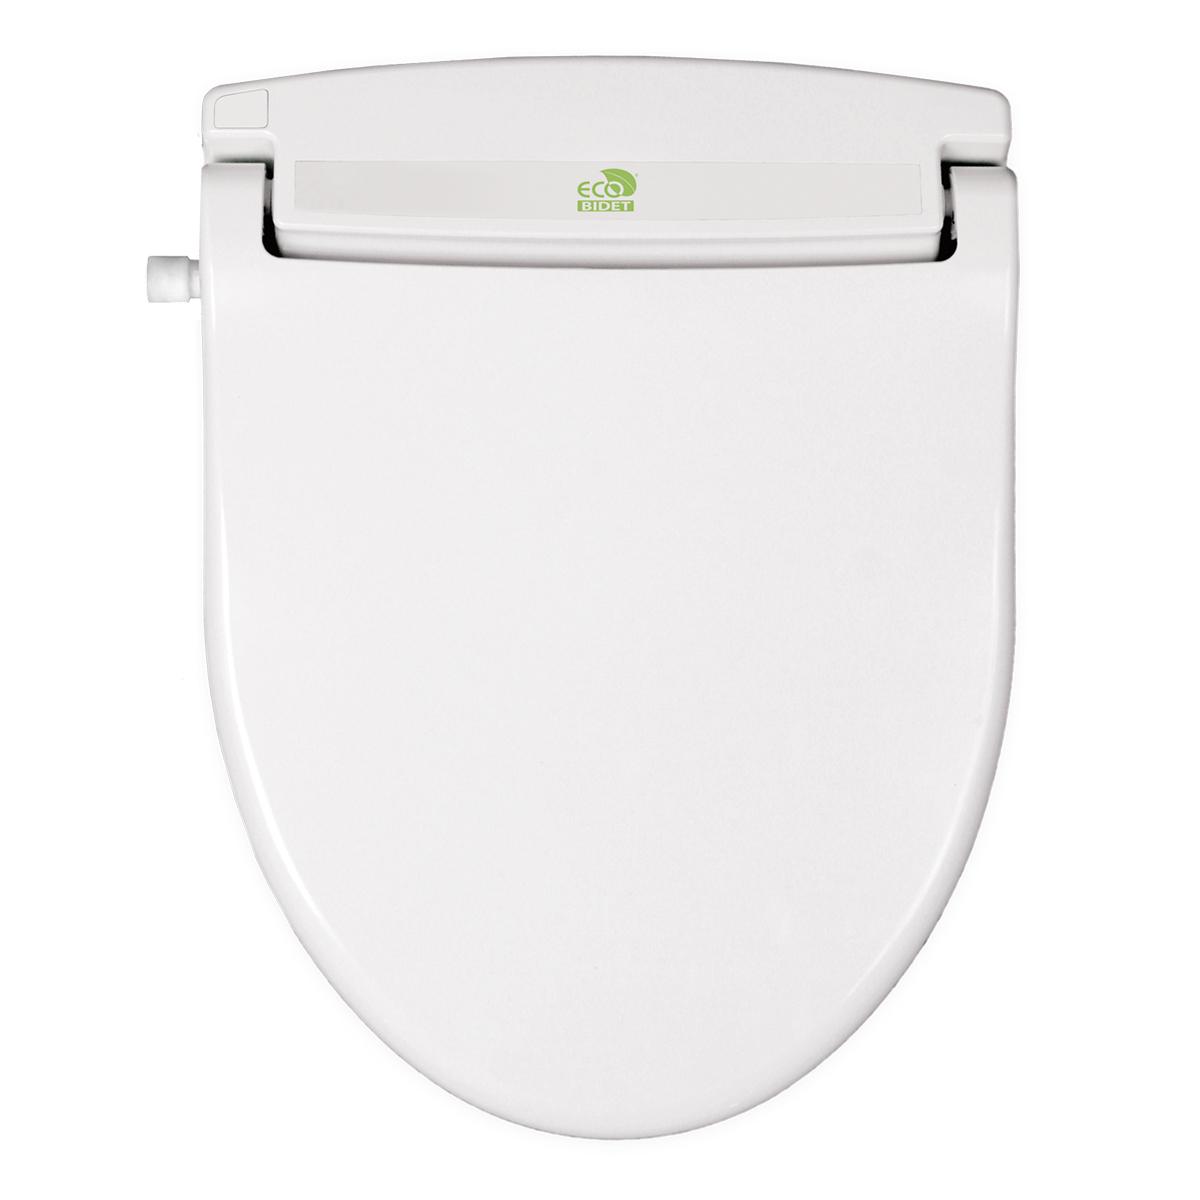 Terrific Bidets Japanese Toilet Seats Bidet Shop Nz Creativecarmelina Interior Chair Design Creativecarmelinacom